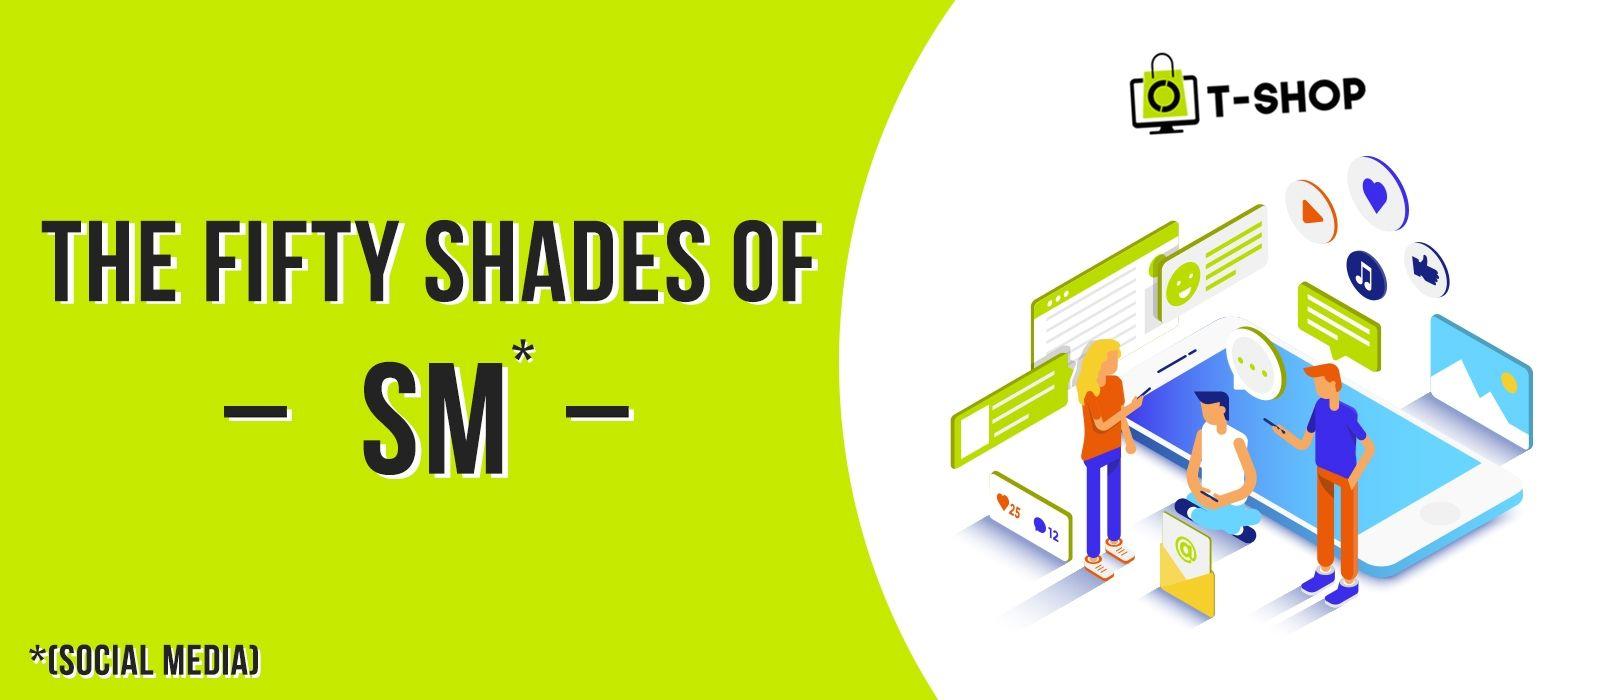 Fitfty shades of social media